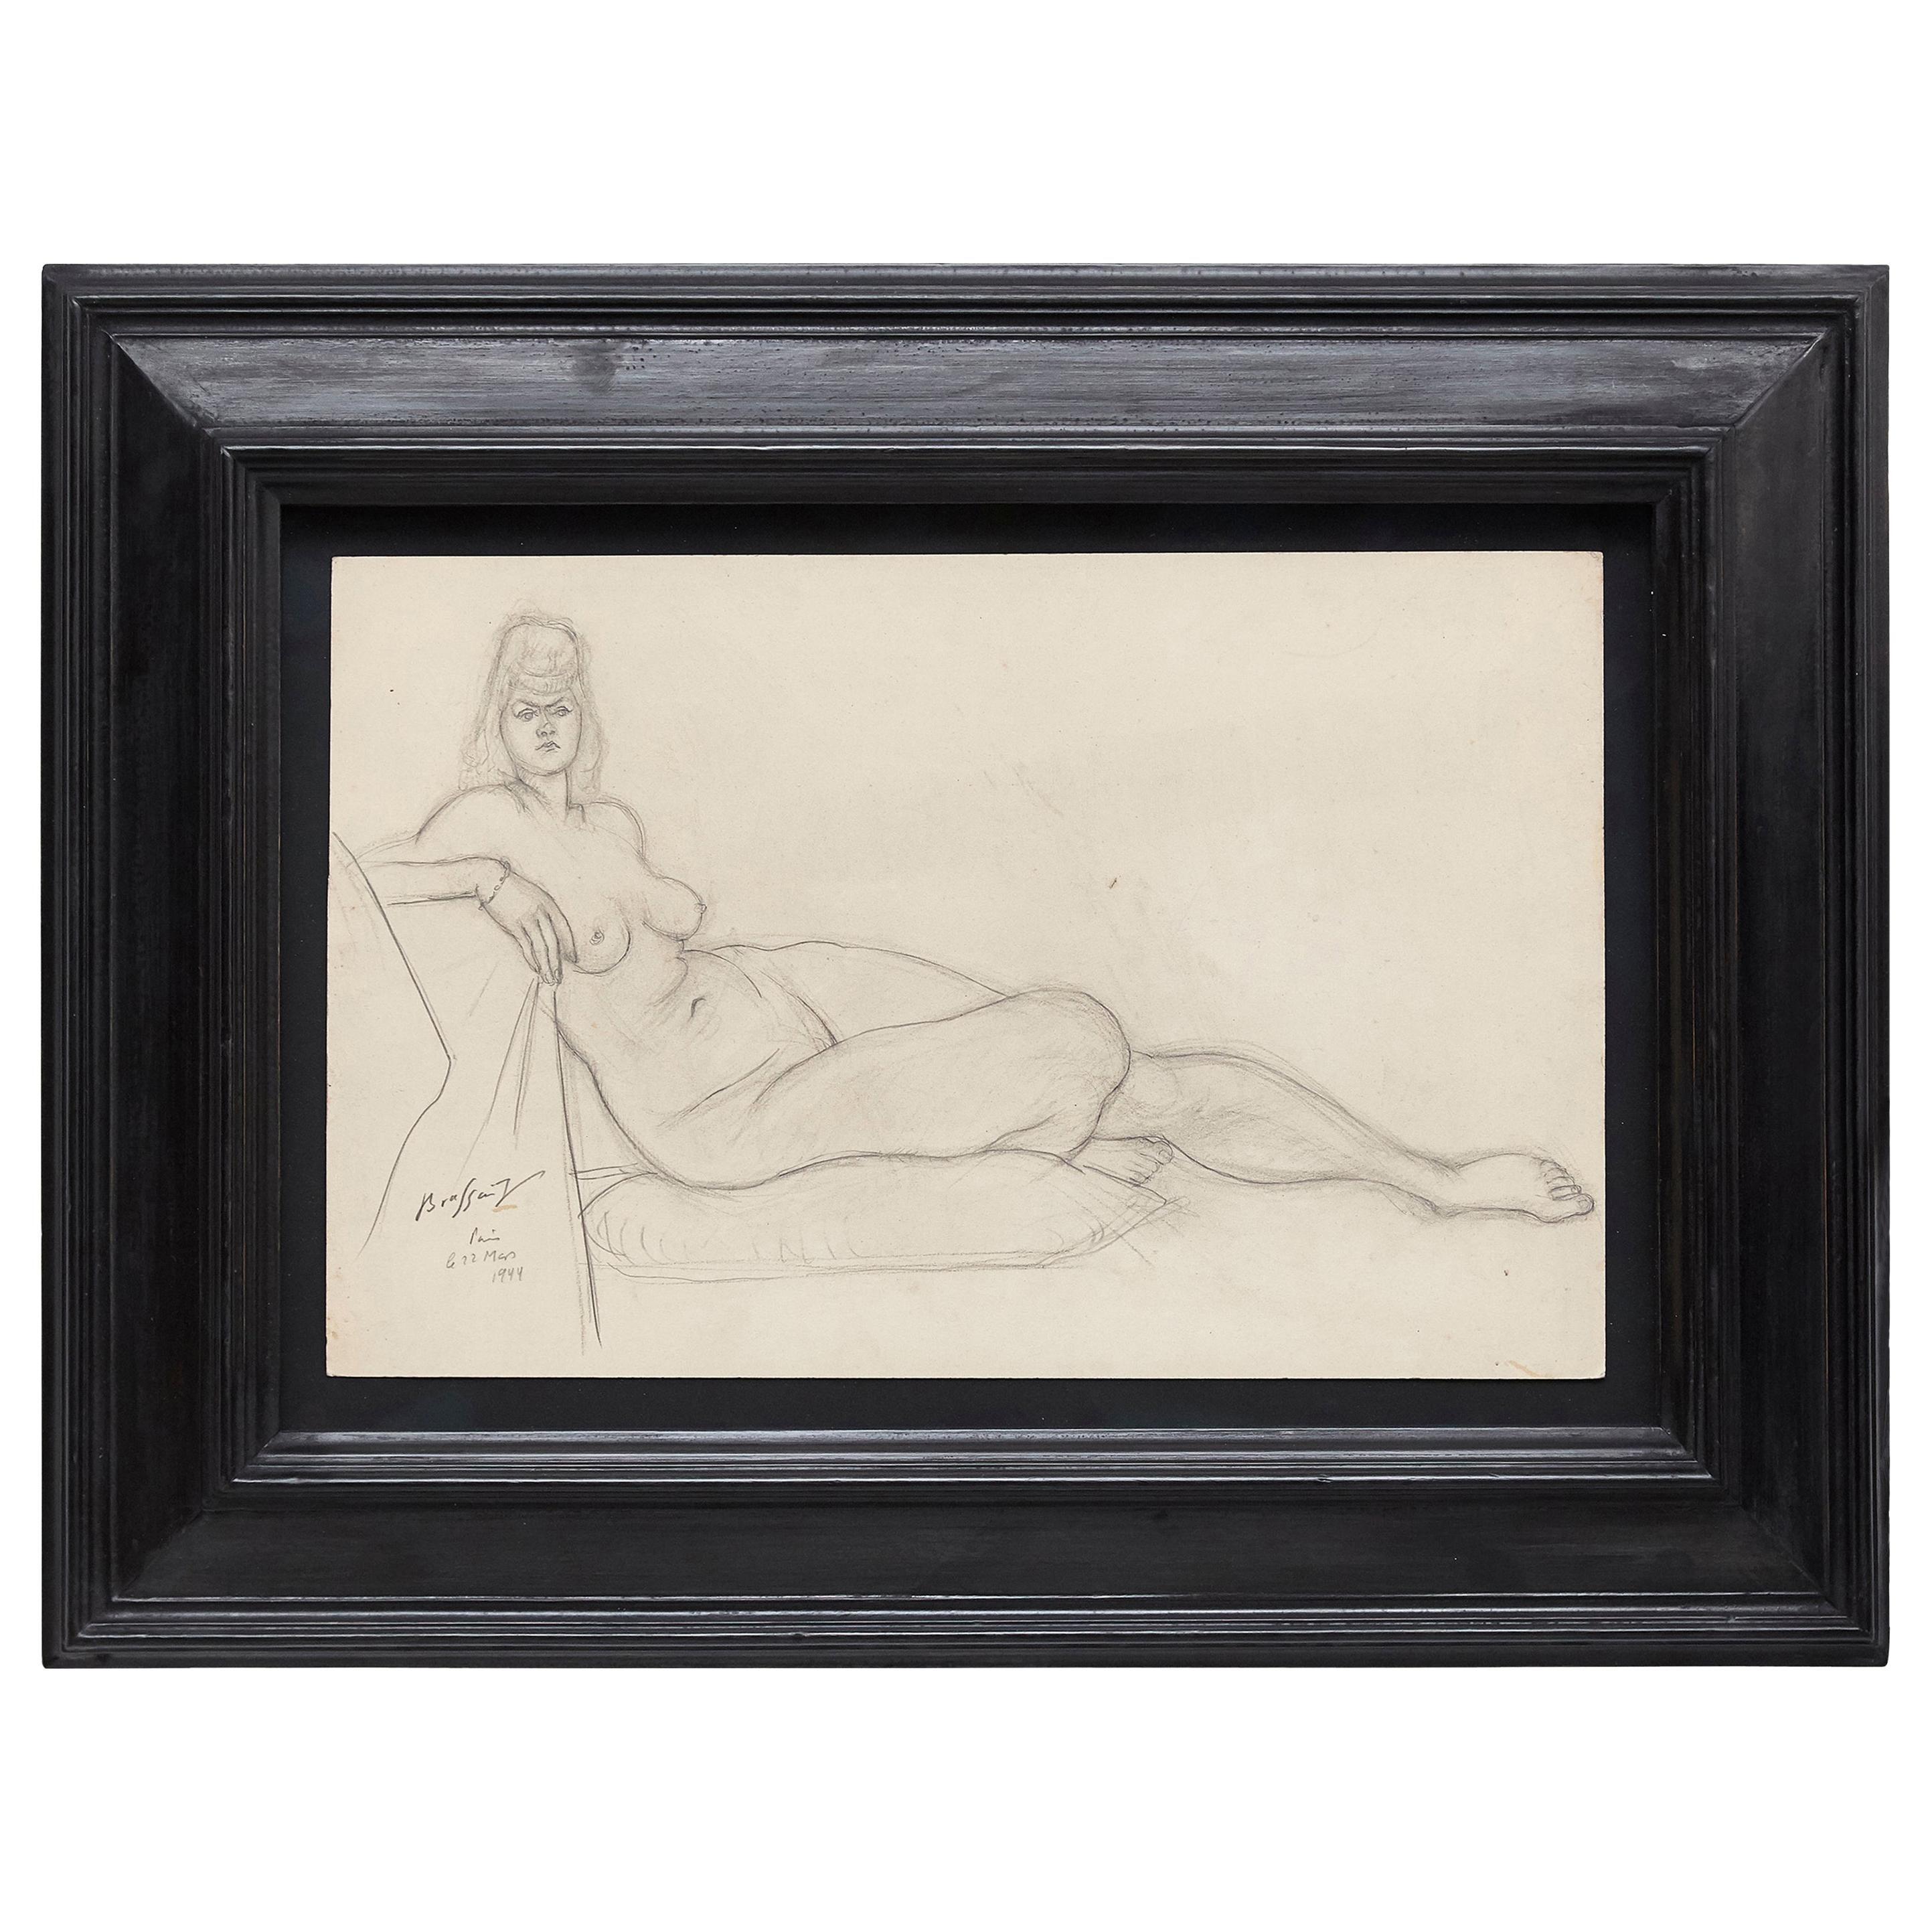 Rare Brassai Woman Nude Pencil Drawing, 1944